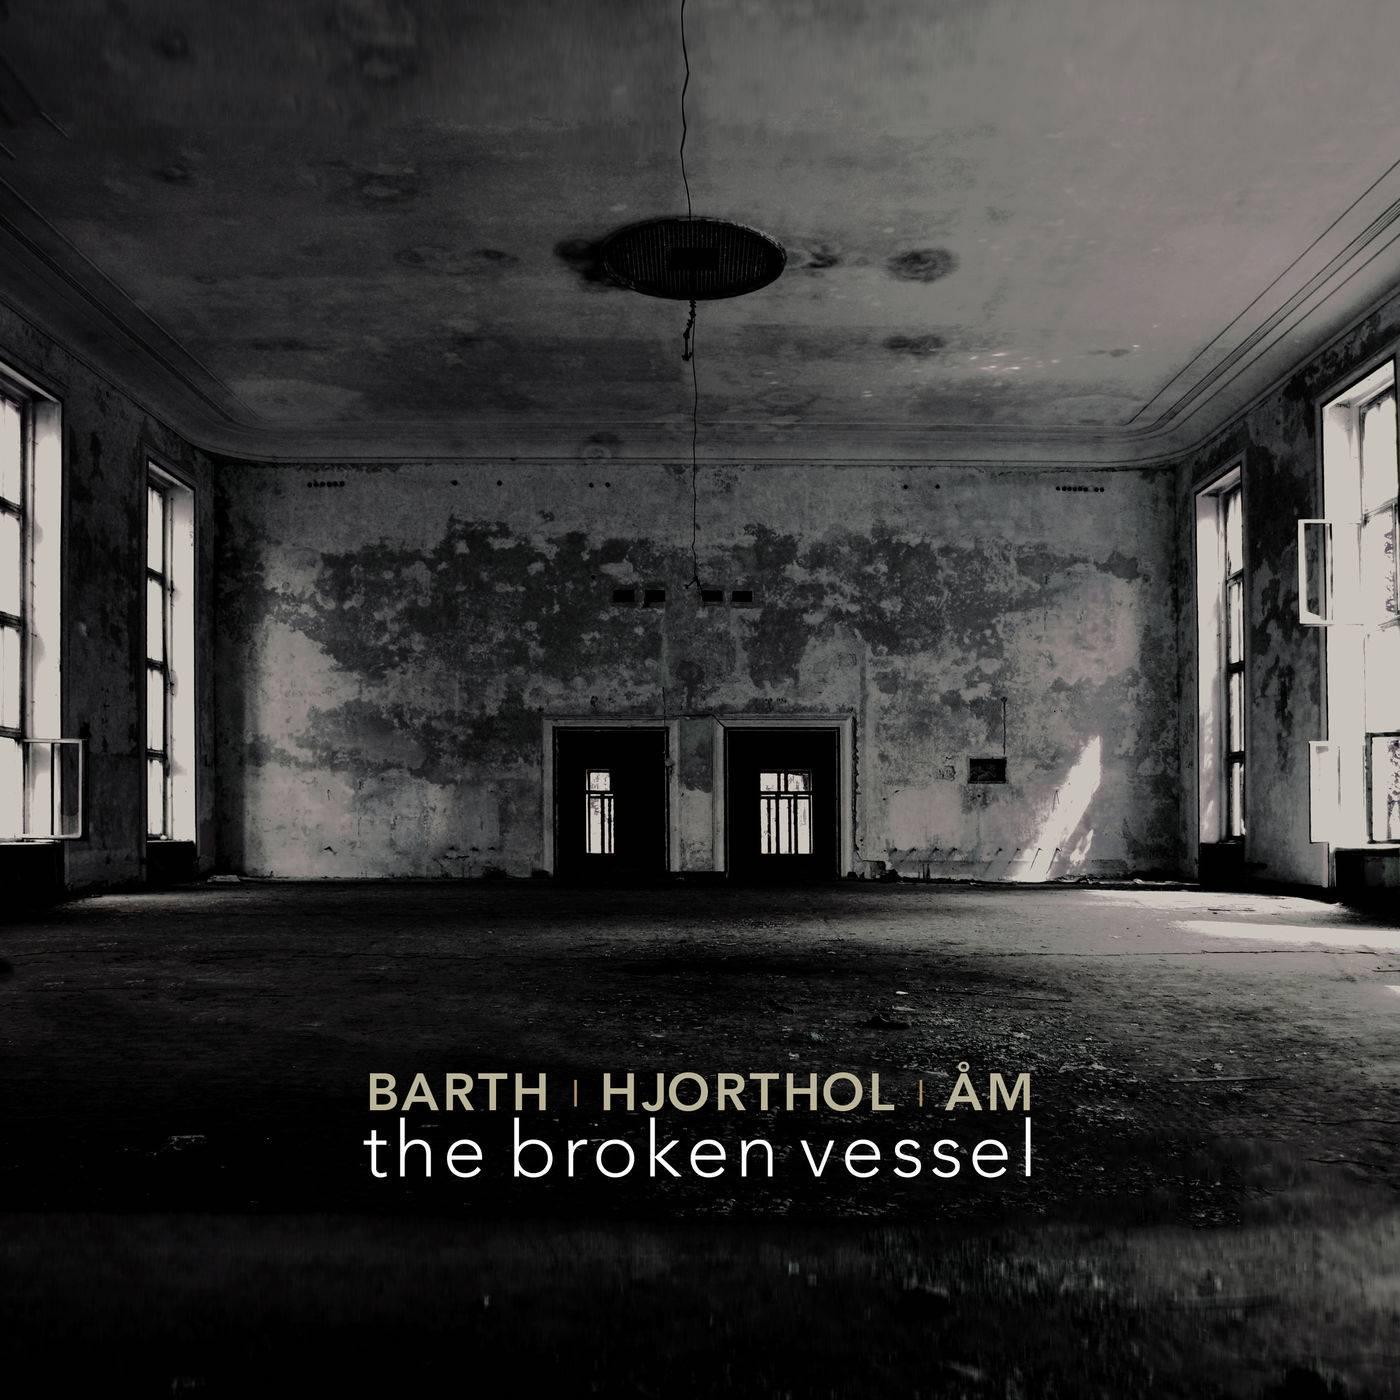 Magnar Åm, Andreas Barth, Geir Hjorthol - Barth, Hjorthol & Åm: The Broken Vessel (2018)